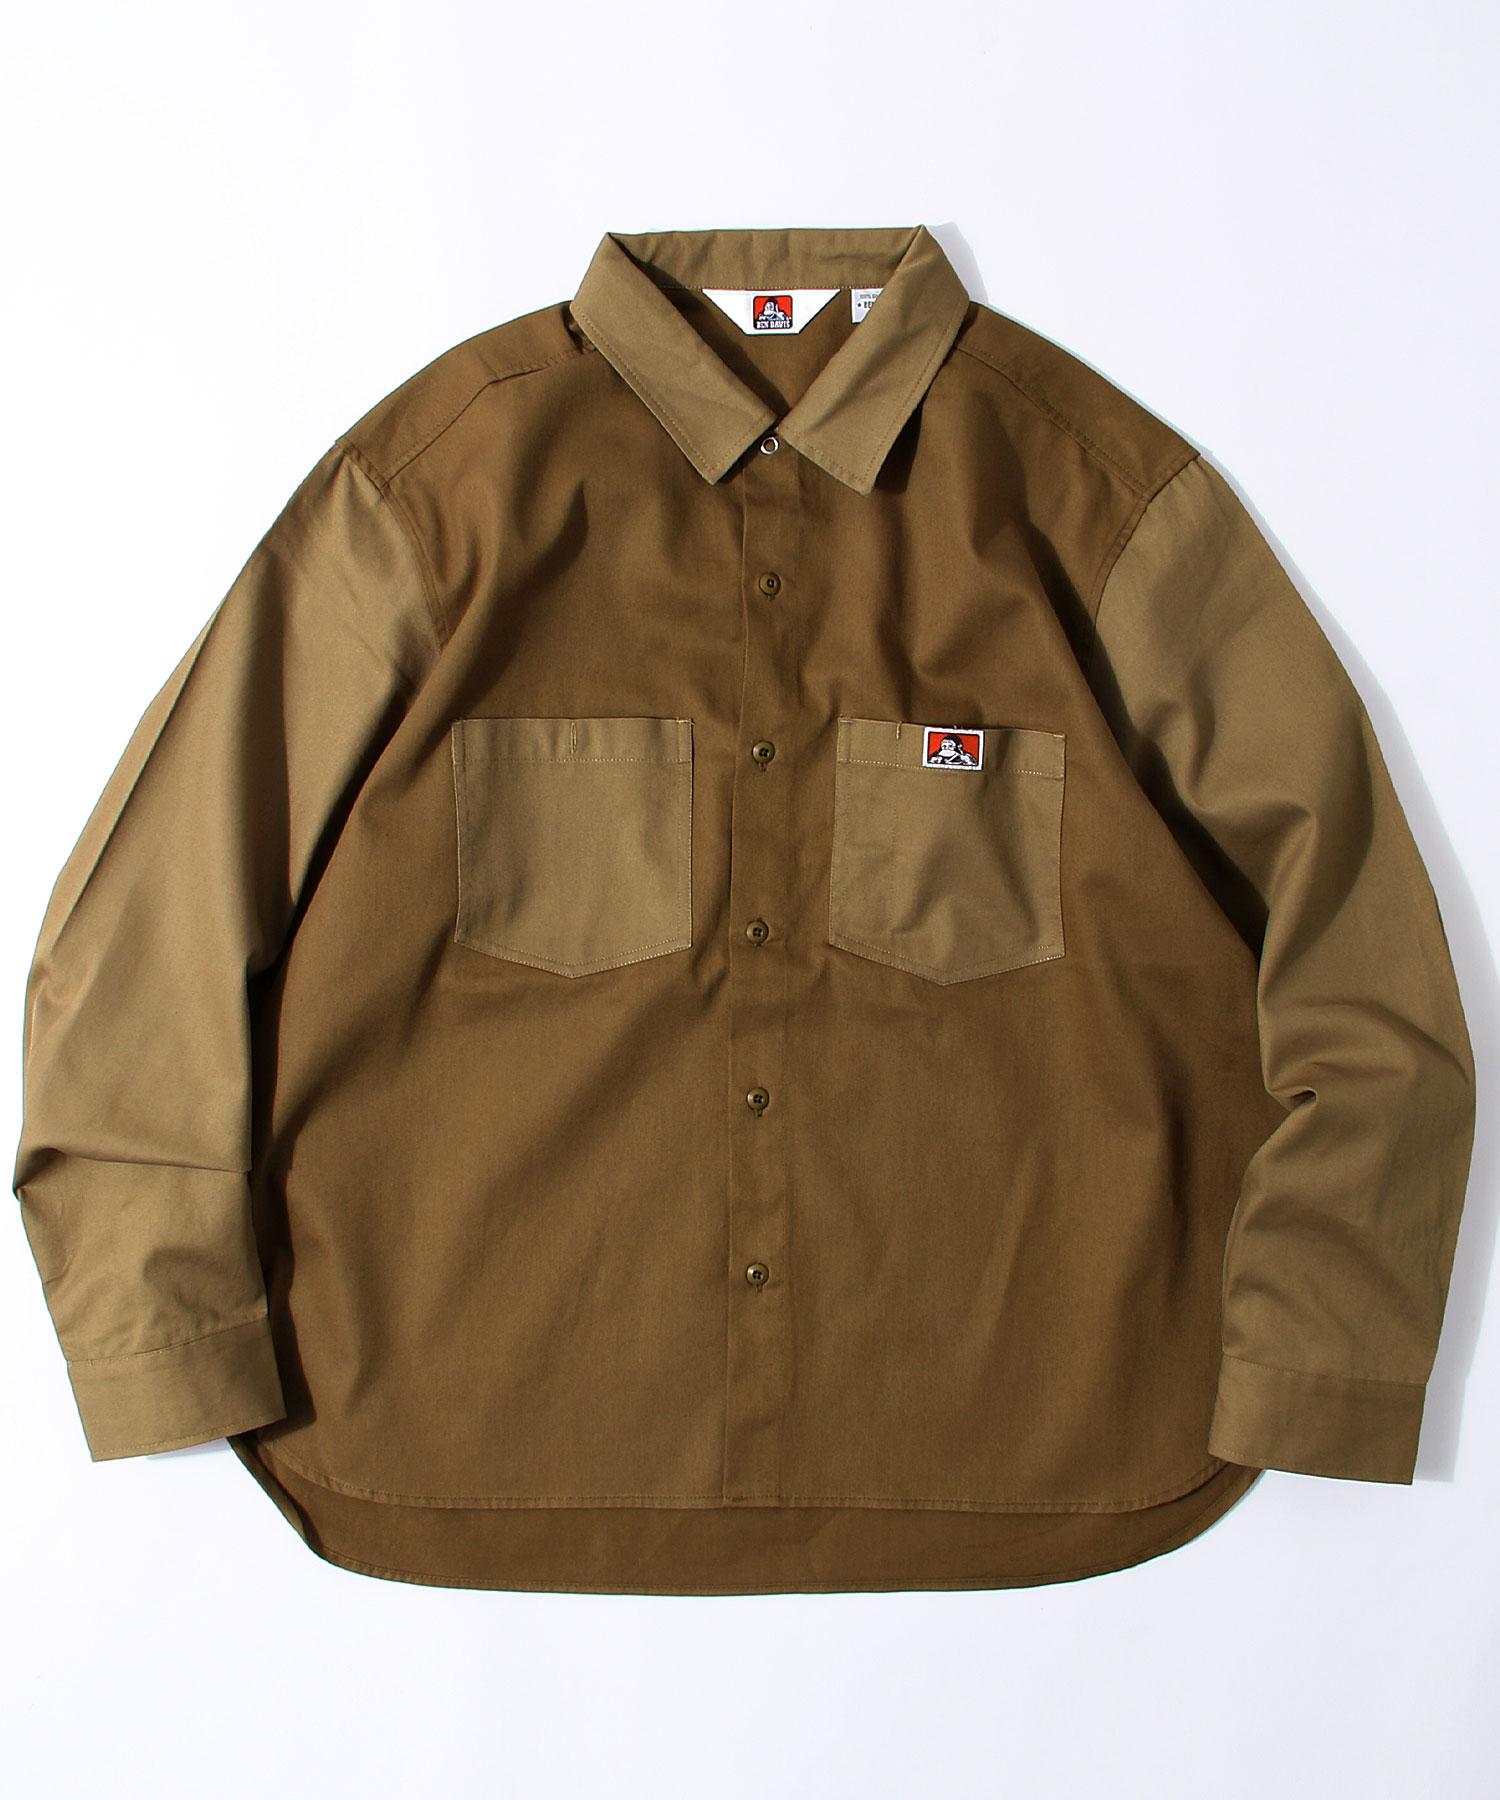 【BEN DAVIS】異色拼接工裝襯衫 1